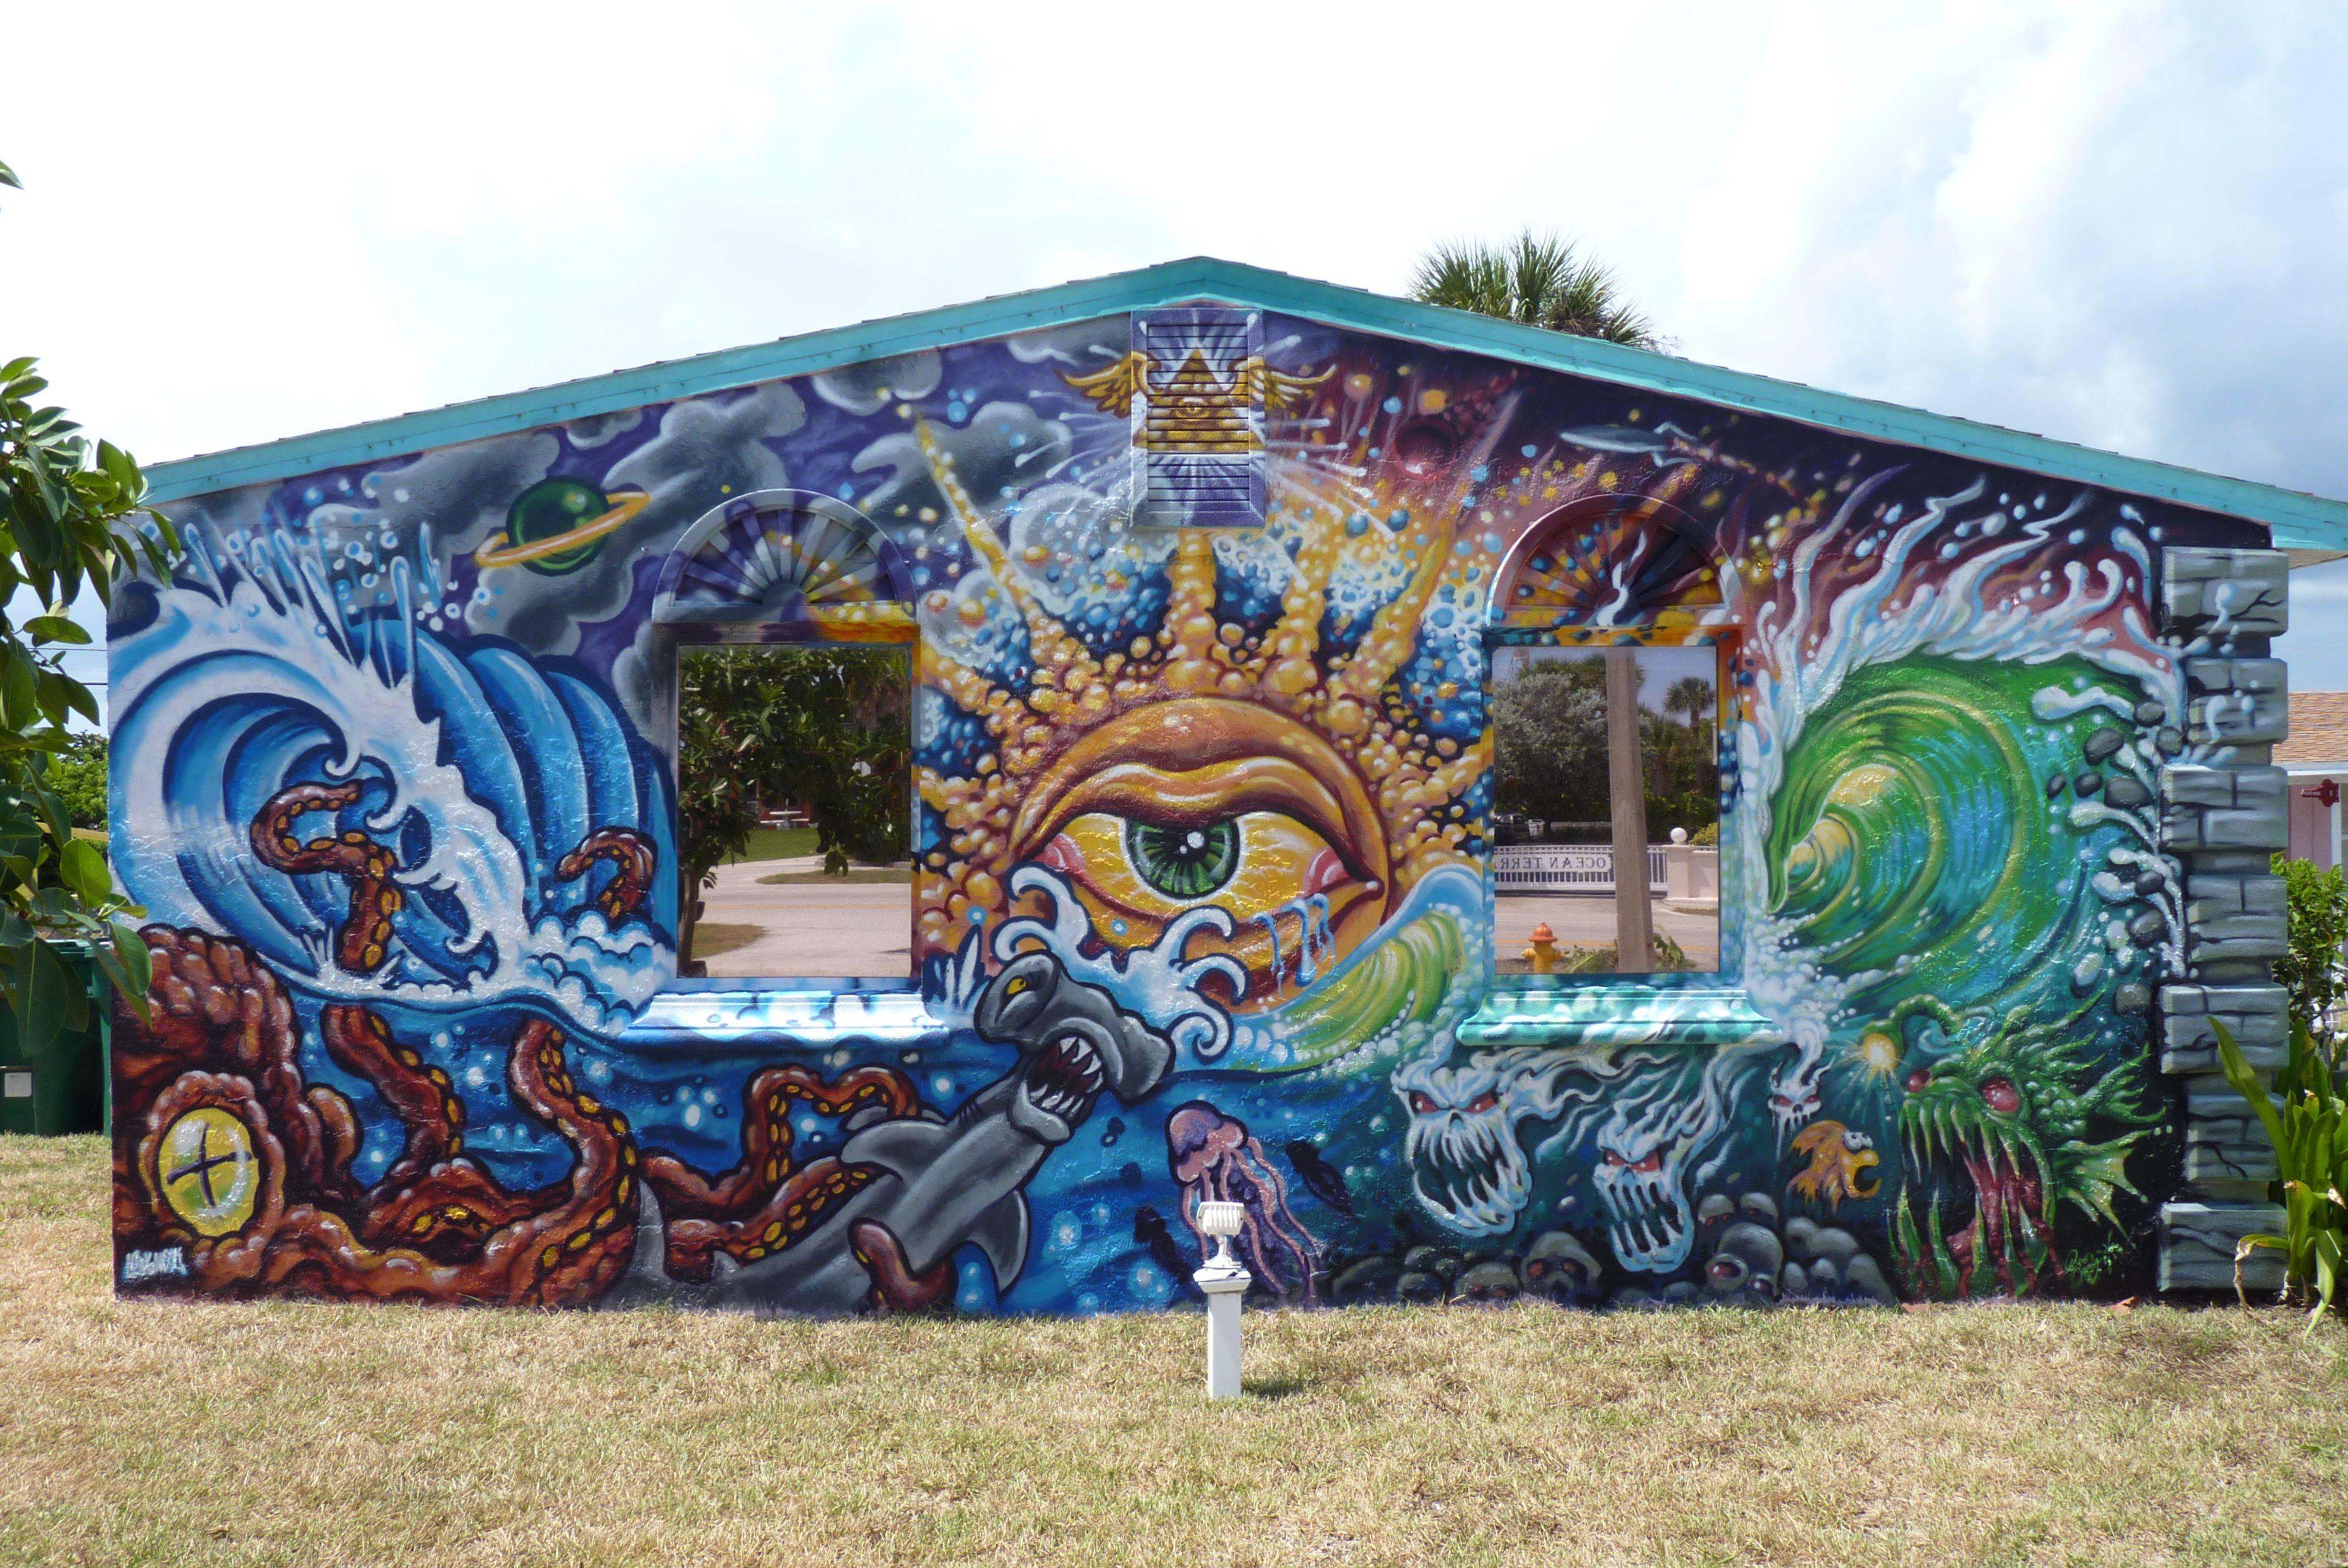 Graffiti wall tattoo - Graffiti On Wall Of Endless Summer Tattoo Parlour Cocoa Beach Florida